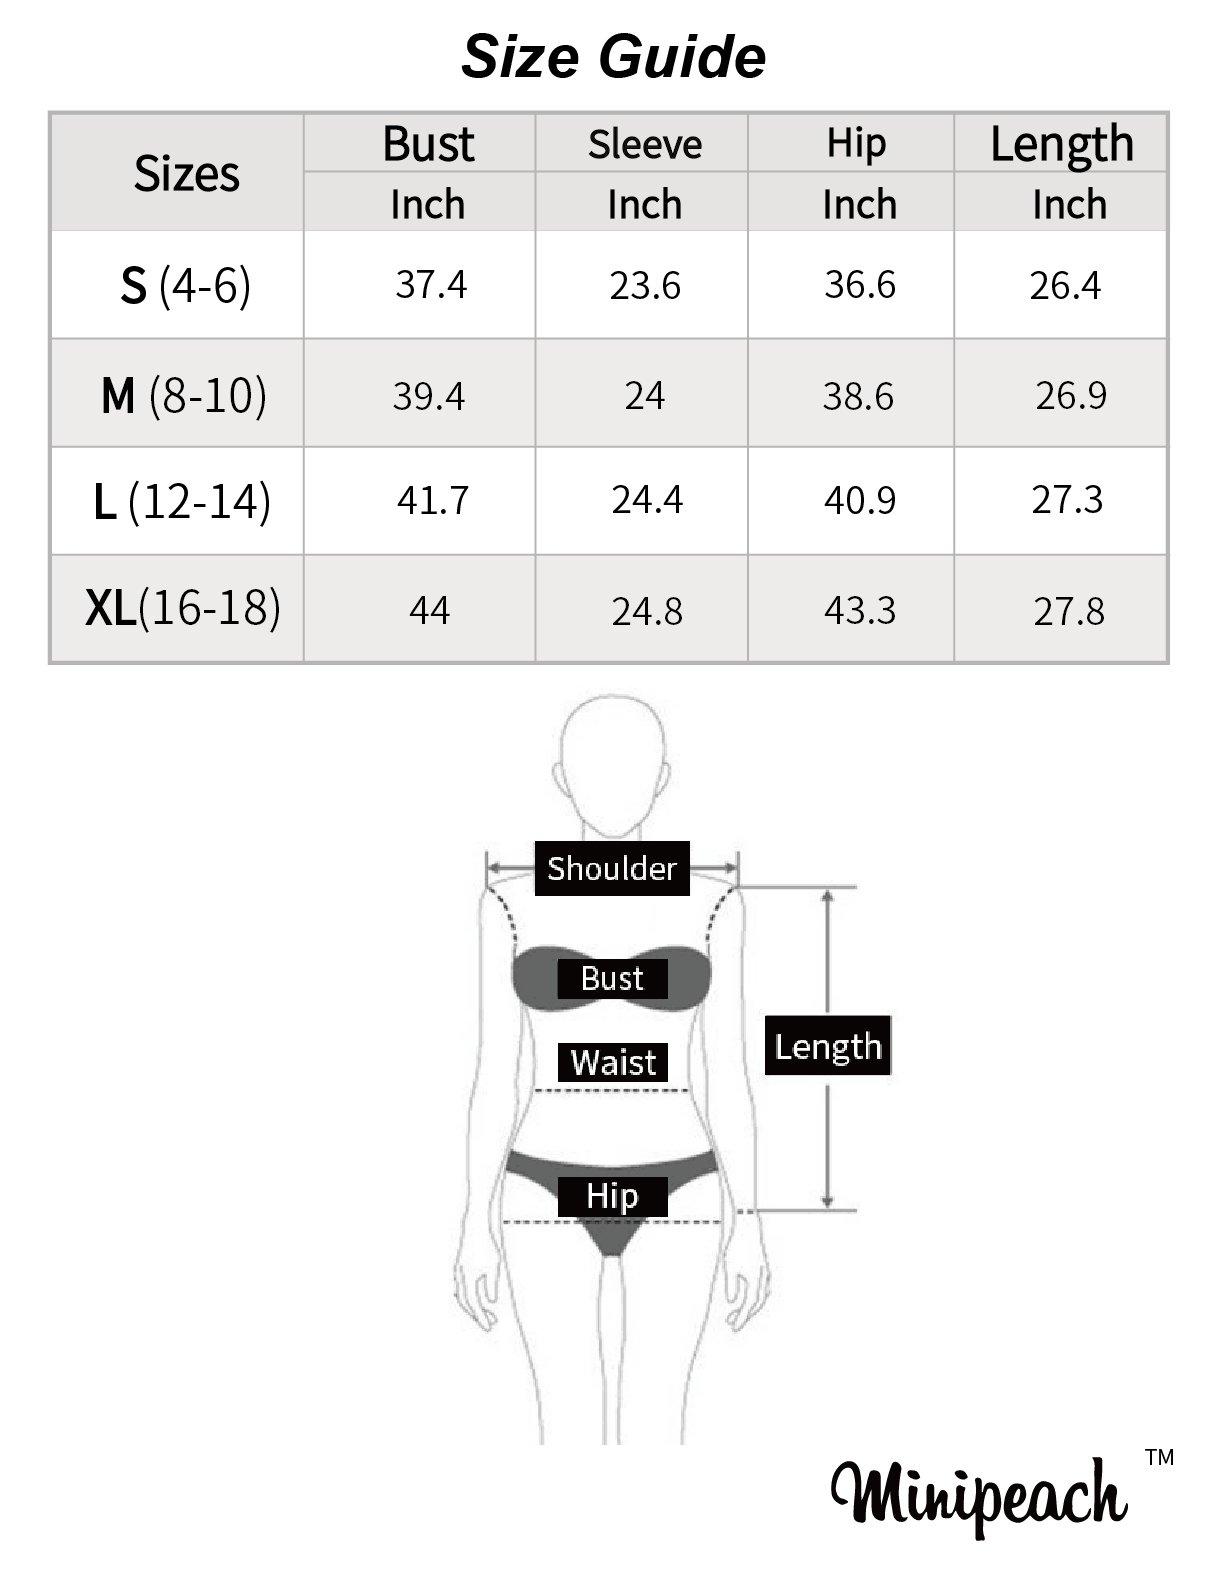 Minipeach Women's Pullover Long Sleeve Hoodies Coat Loose Casual Sweatshirts with Pocket by Minipeach (Image #7)